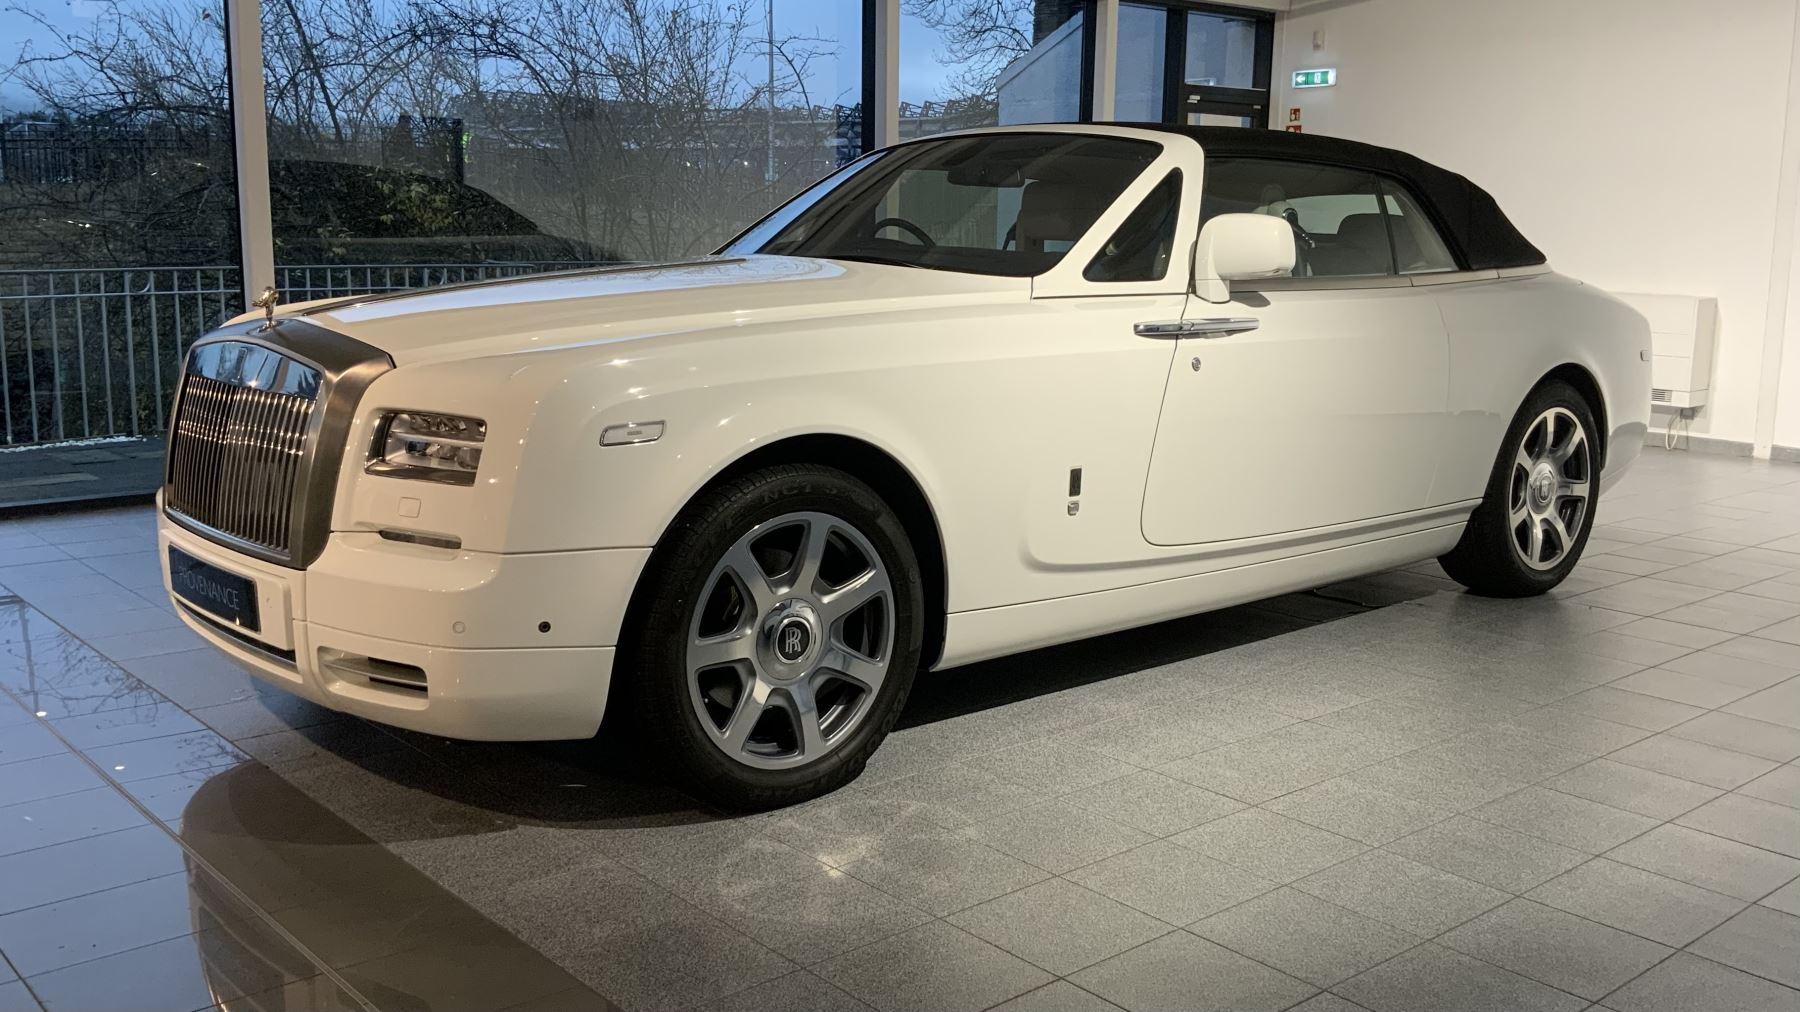 Rolls-Royce Phantom Drophead Coupe Series 2 image 15